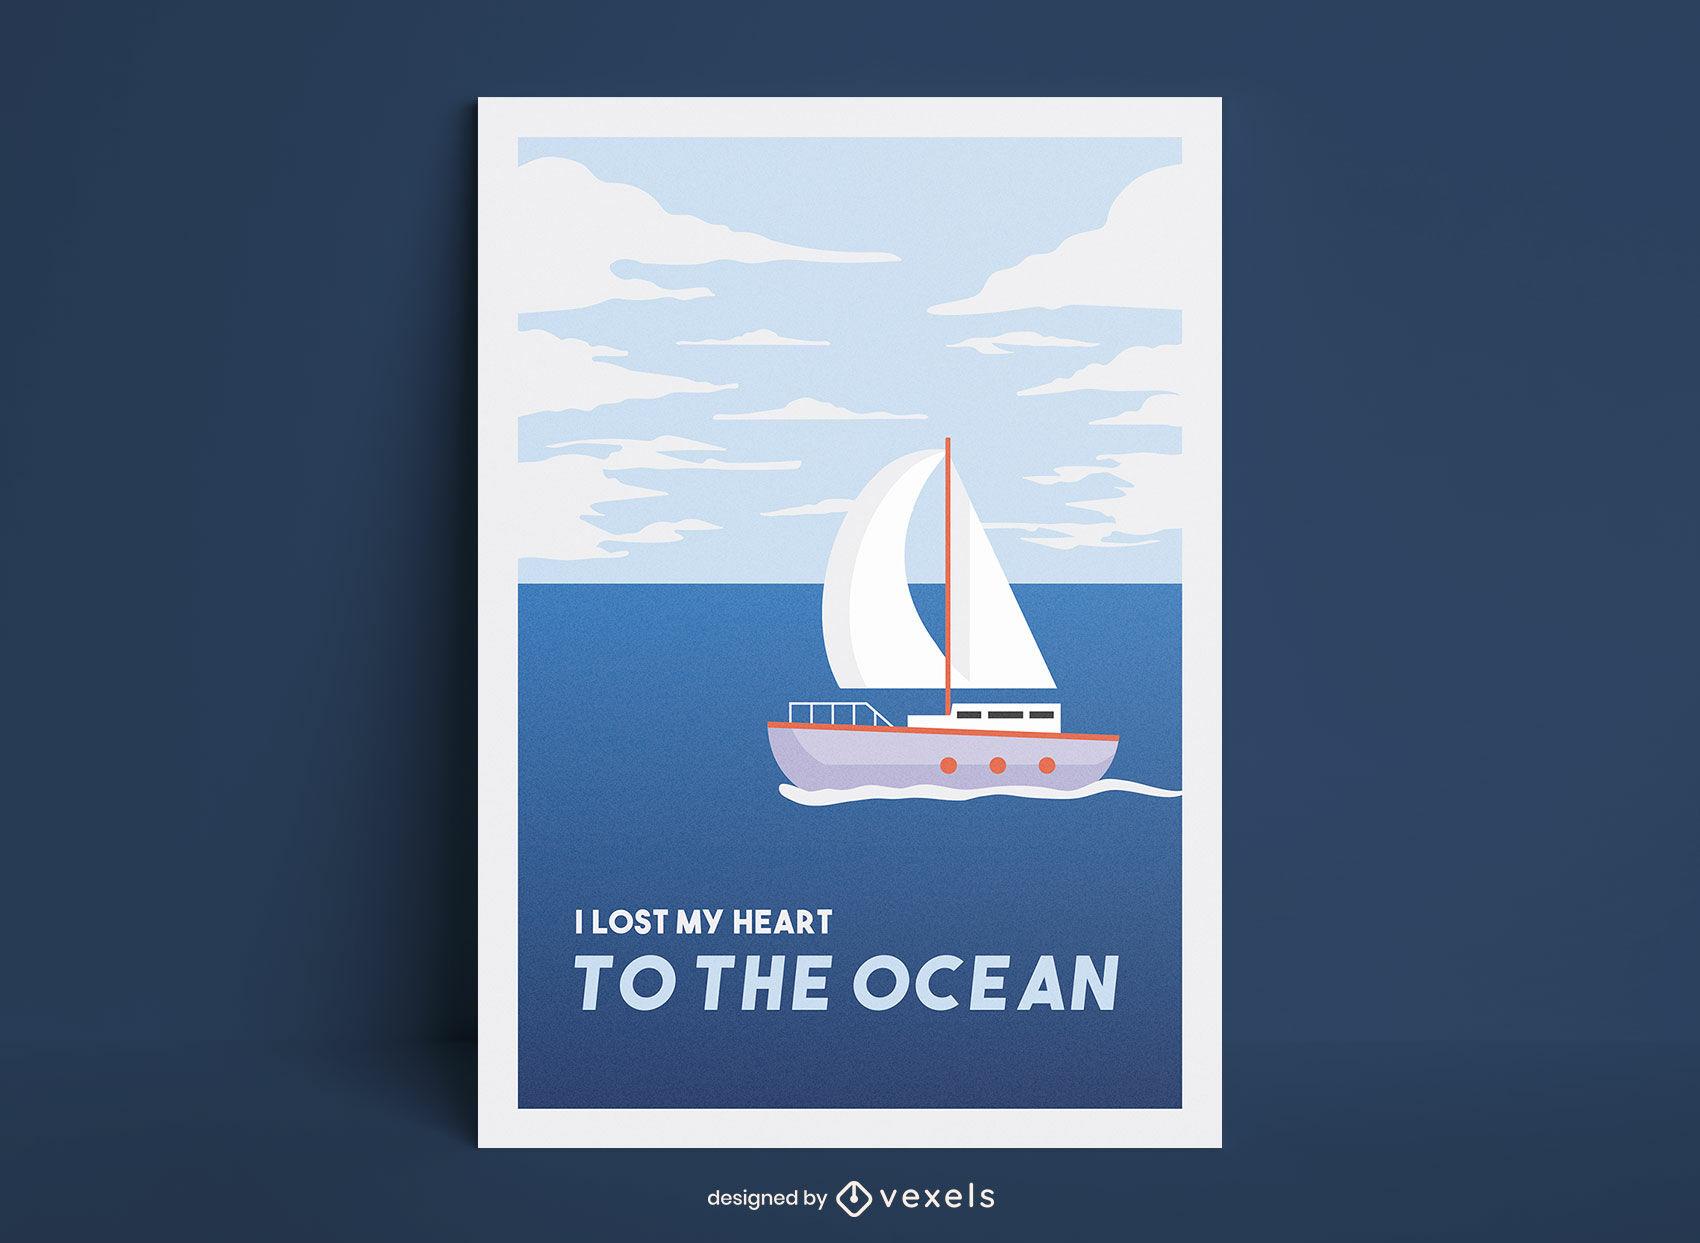 Sailing ship poster illustration